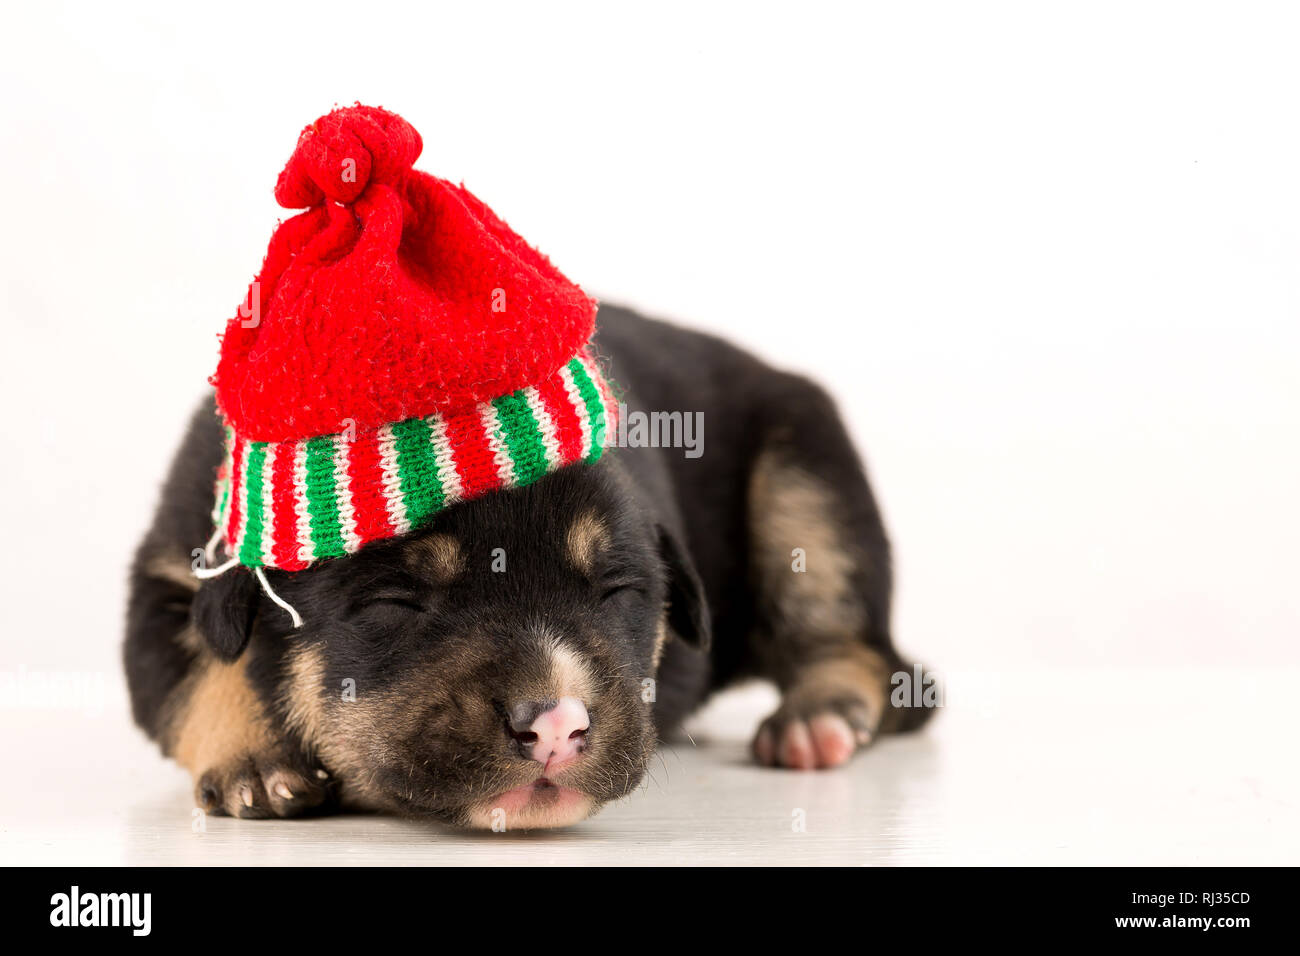 poor little newborn puppy - Stock Image